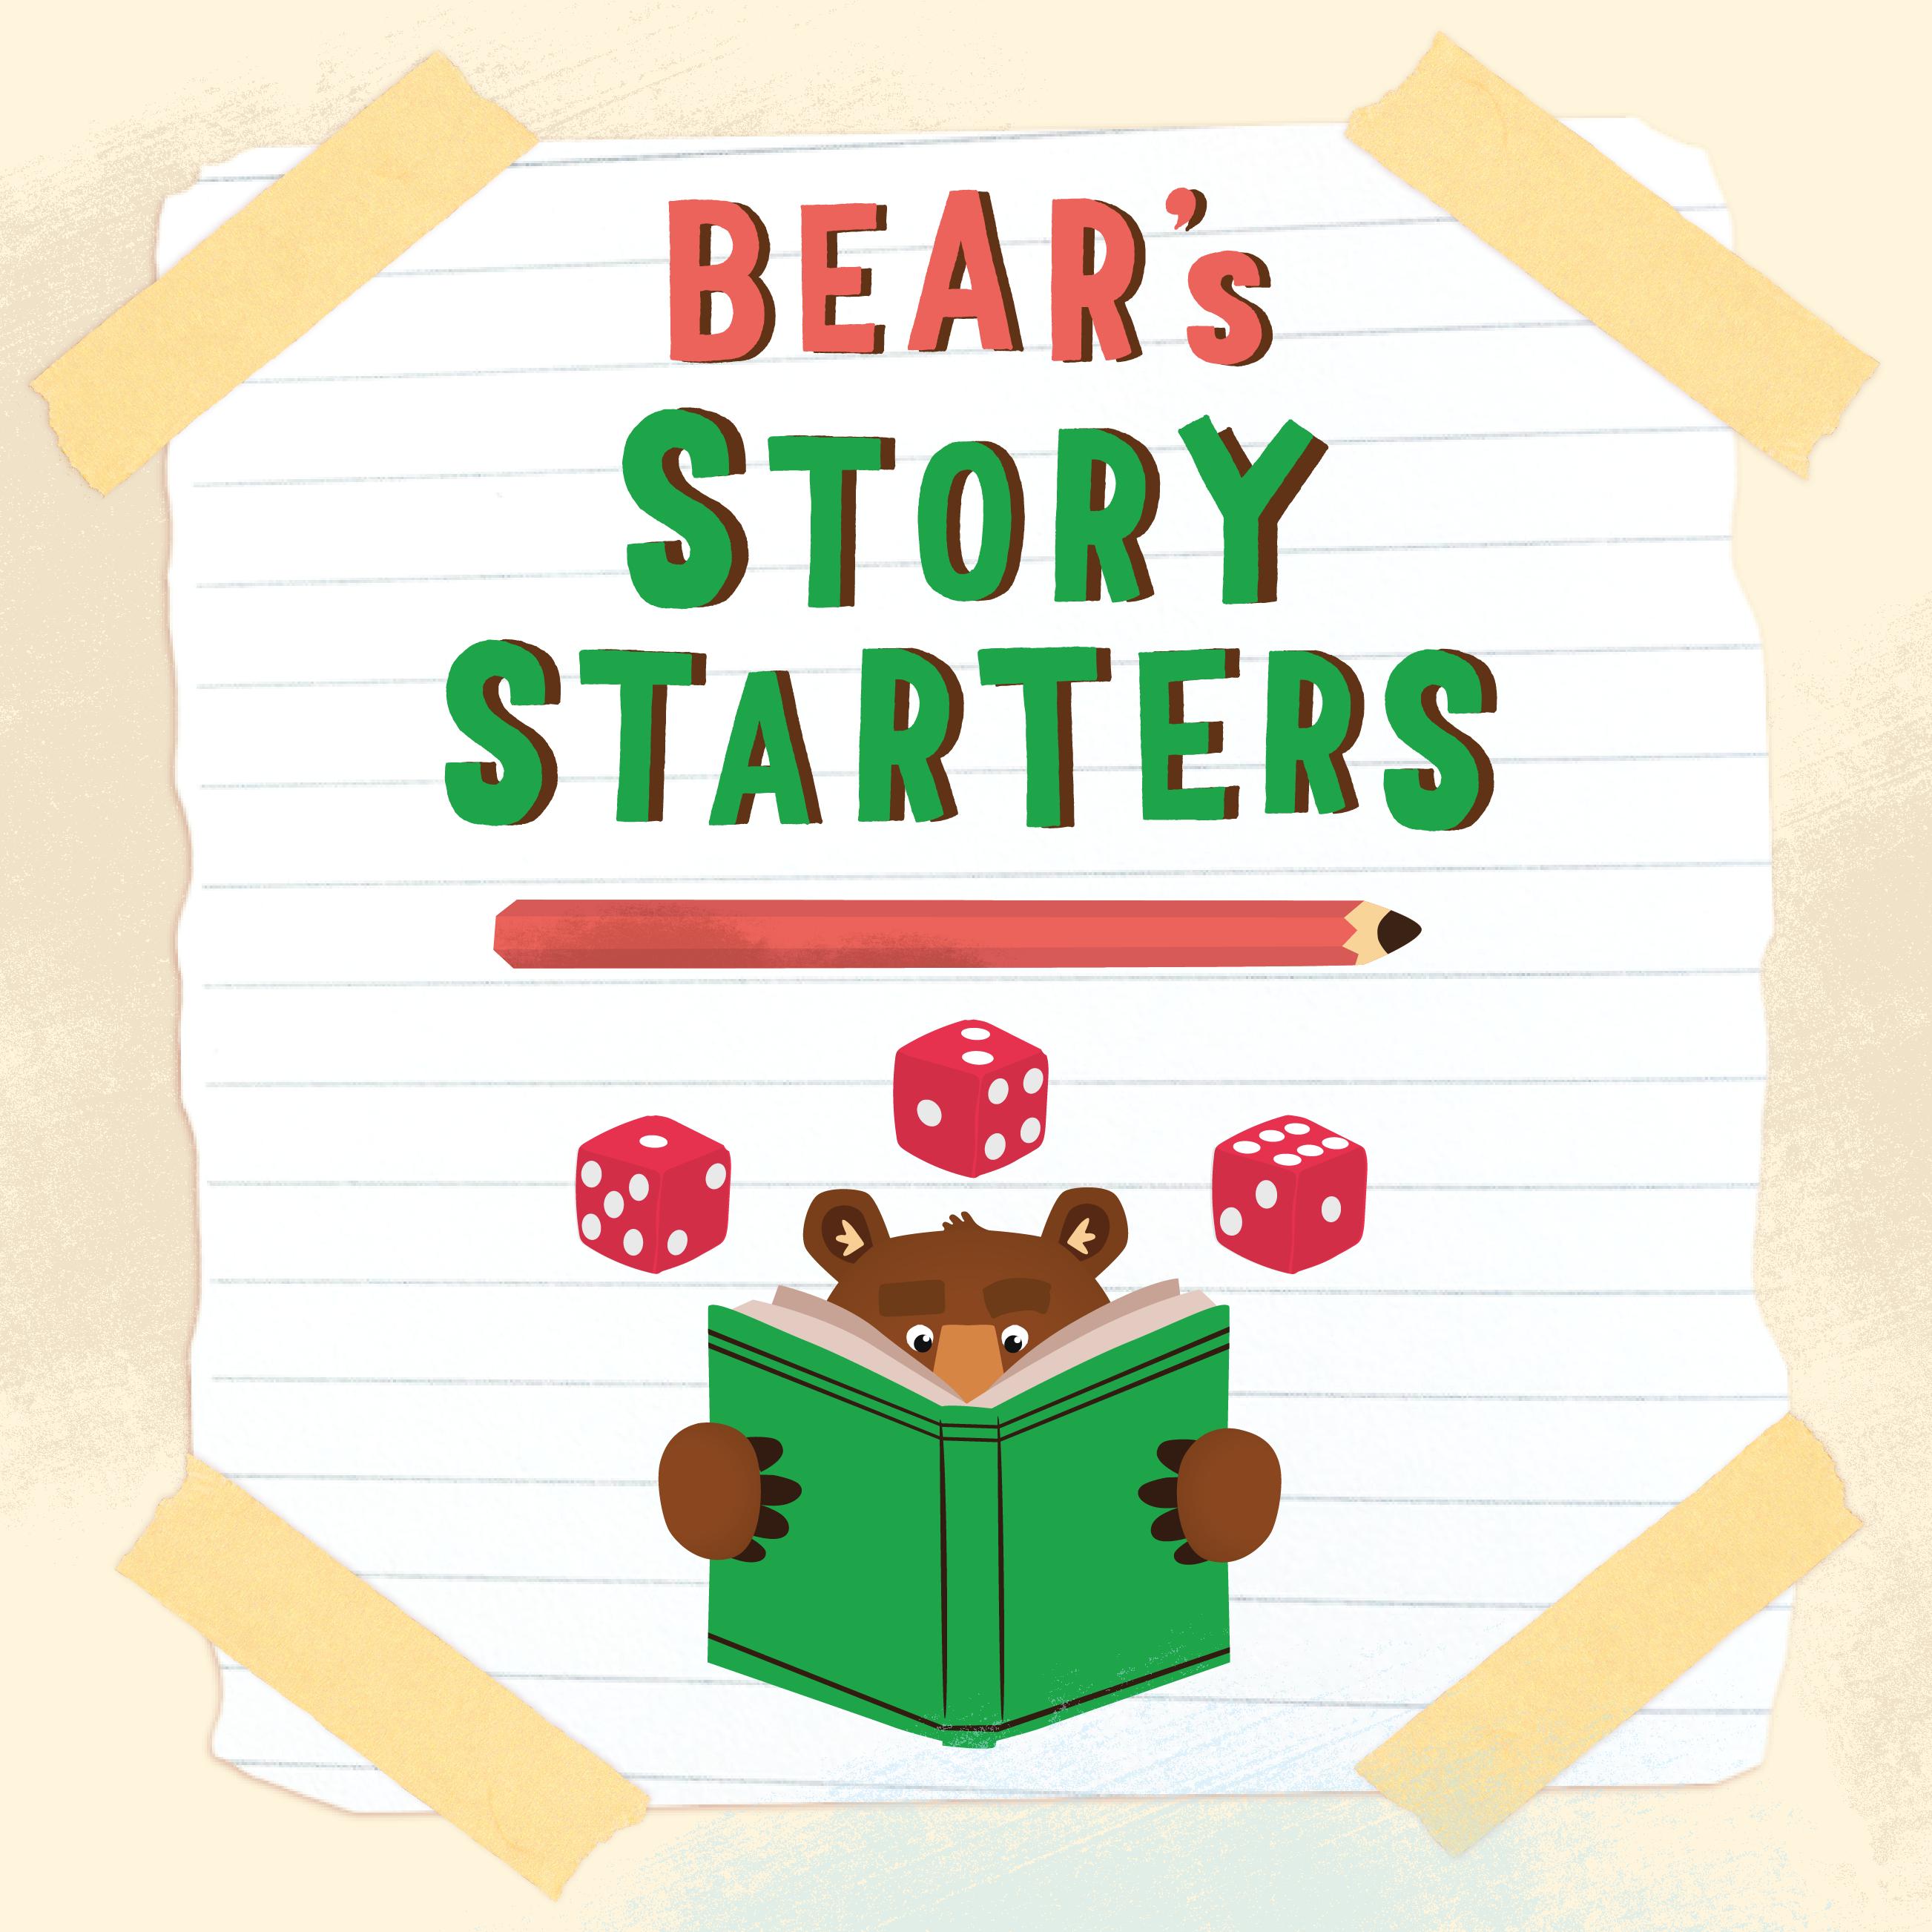 BEARs story starter activity